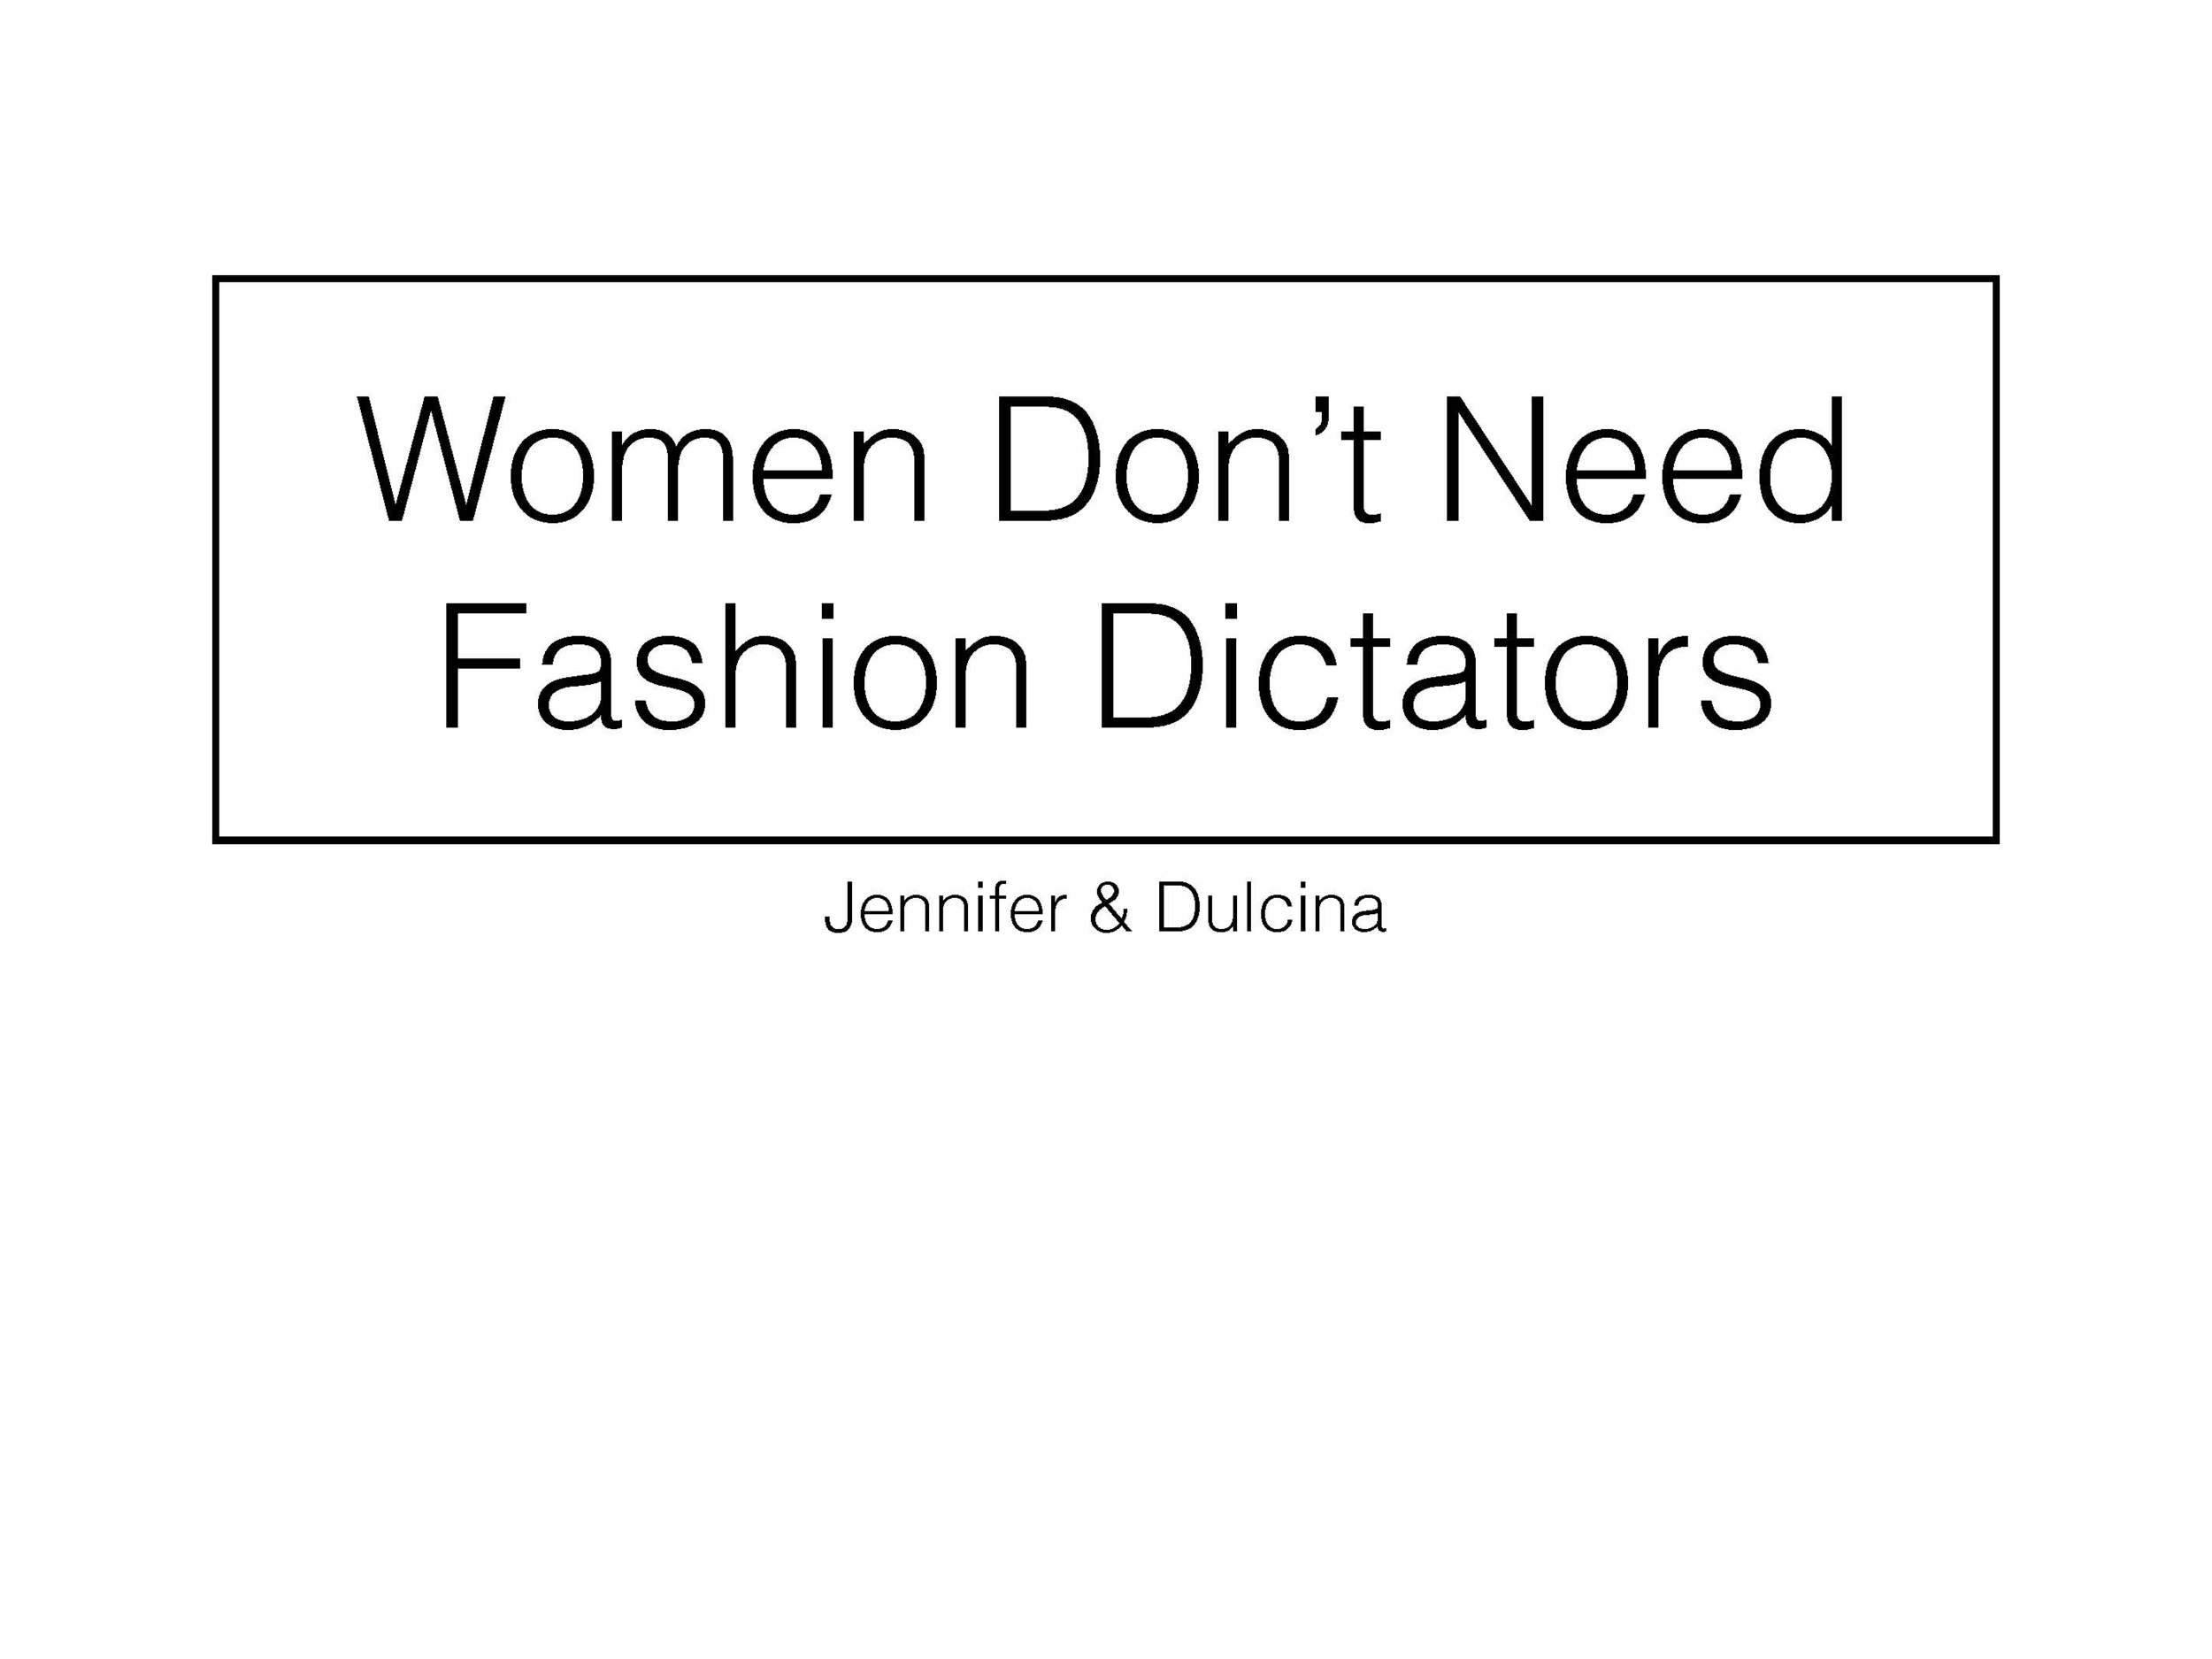 NYC Fashion Presentation_Page_1.jpg